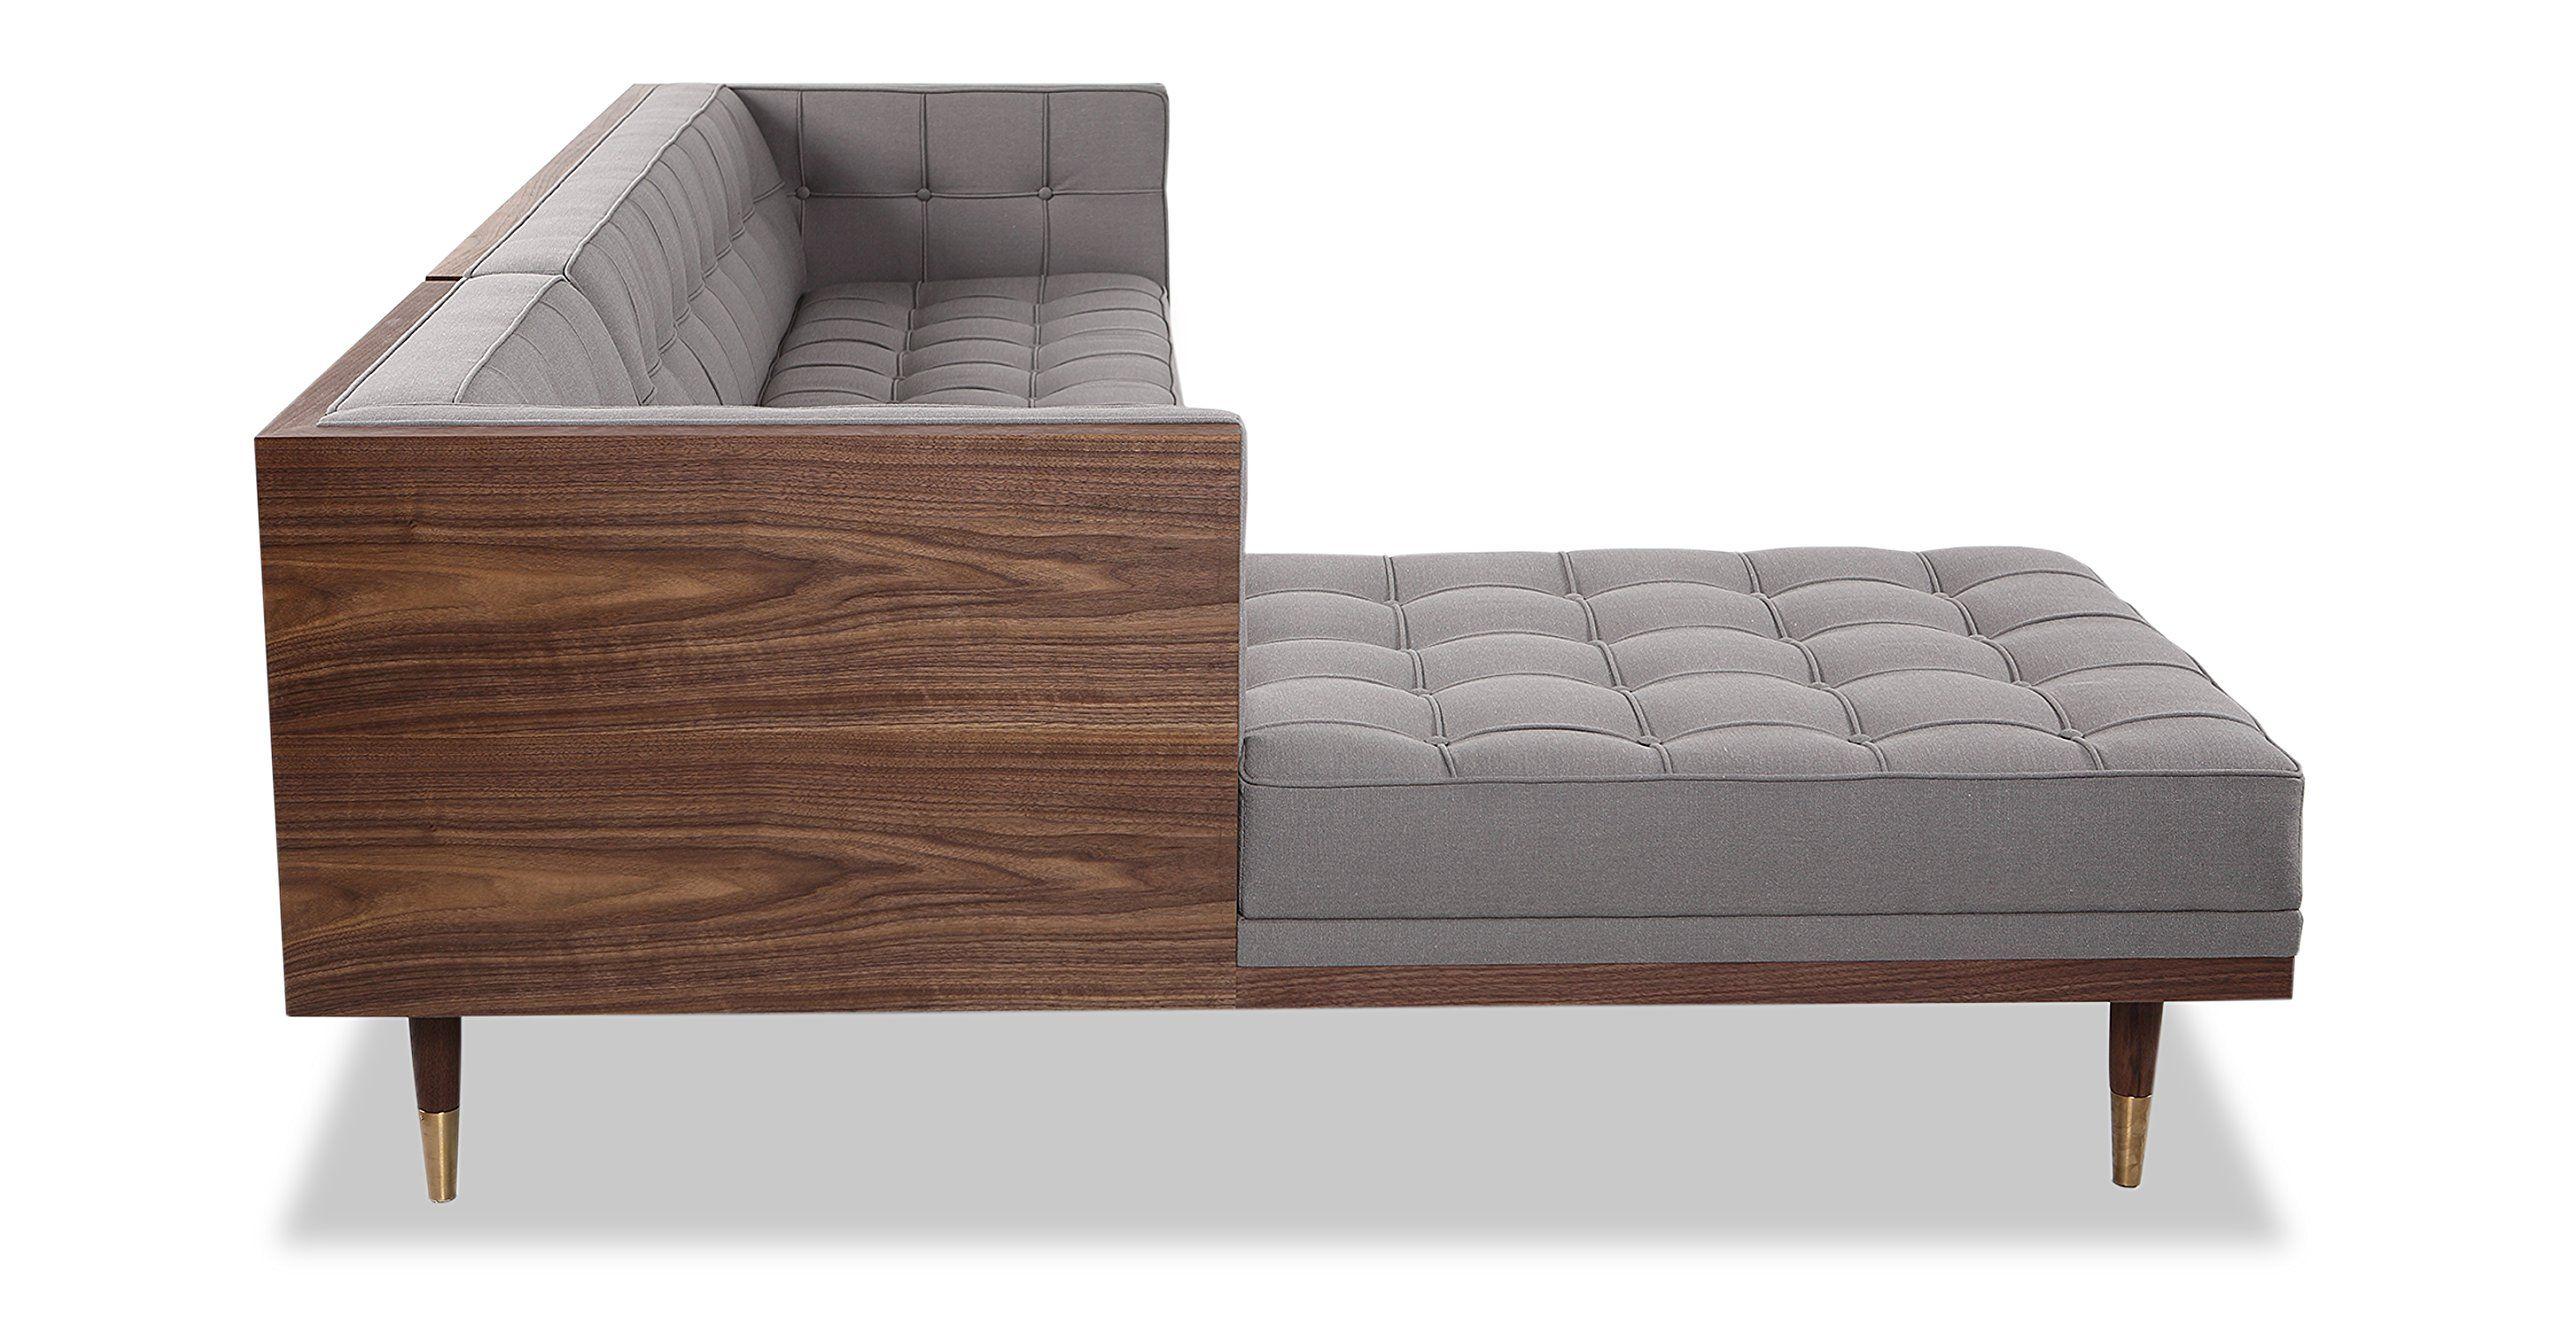 Swell Kardiel Woodrow Midcentury Modern Box Sofa Sectional Left Cjindustries Chair Design For Home Cjindustriesco